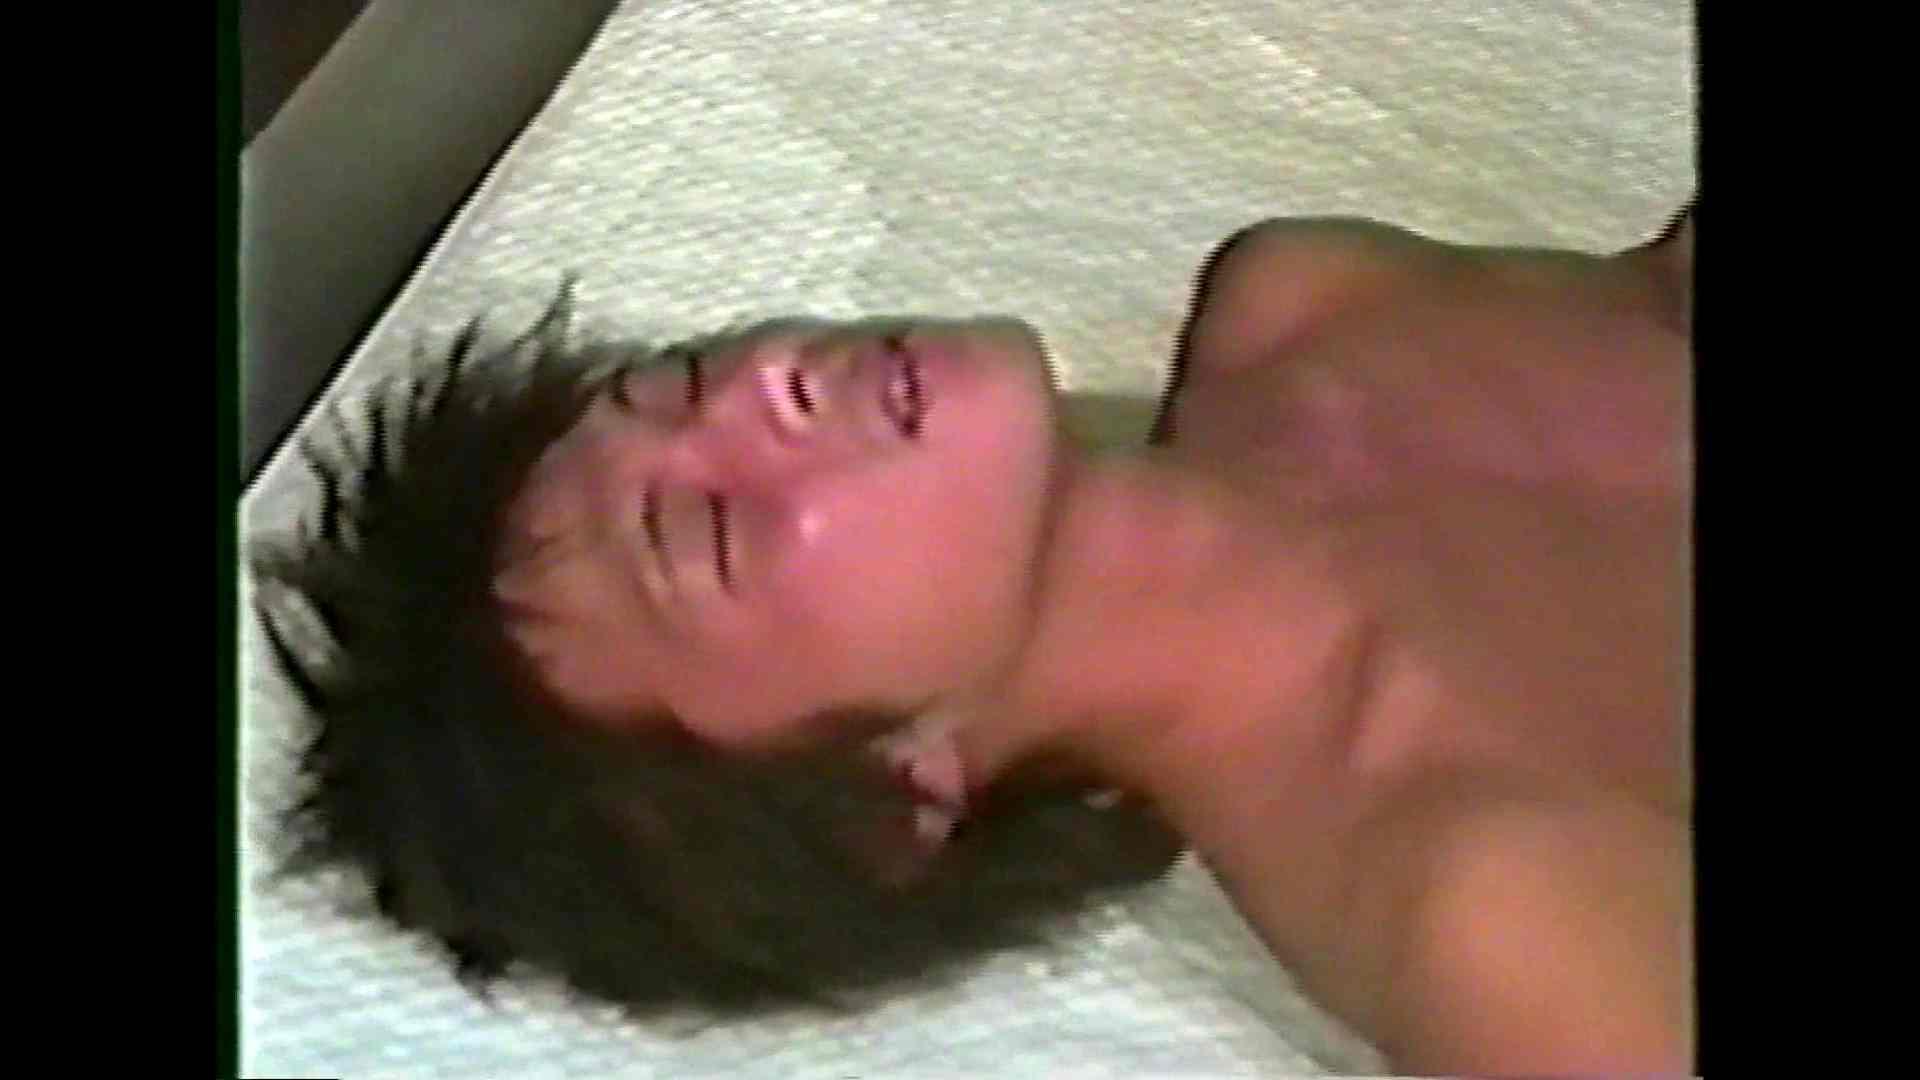 GAYBOY宏のオカズ倉庫Vol.3-3 オナニー ゲイヌード画像 91pic 32